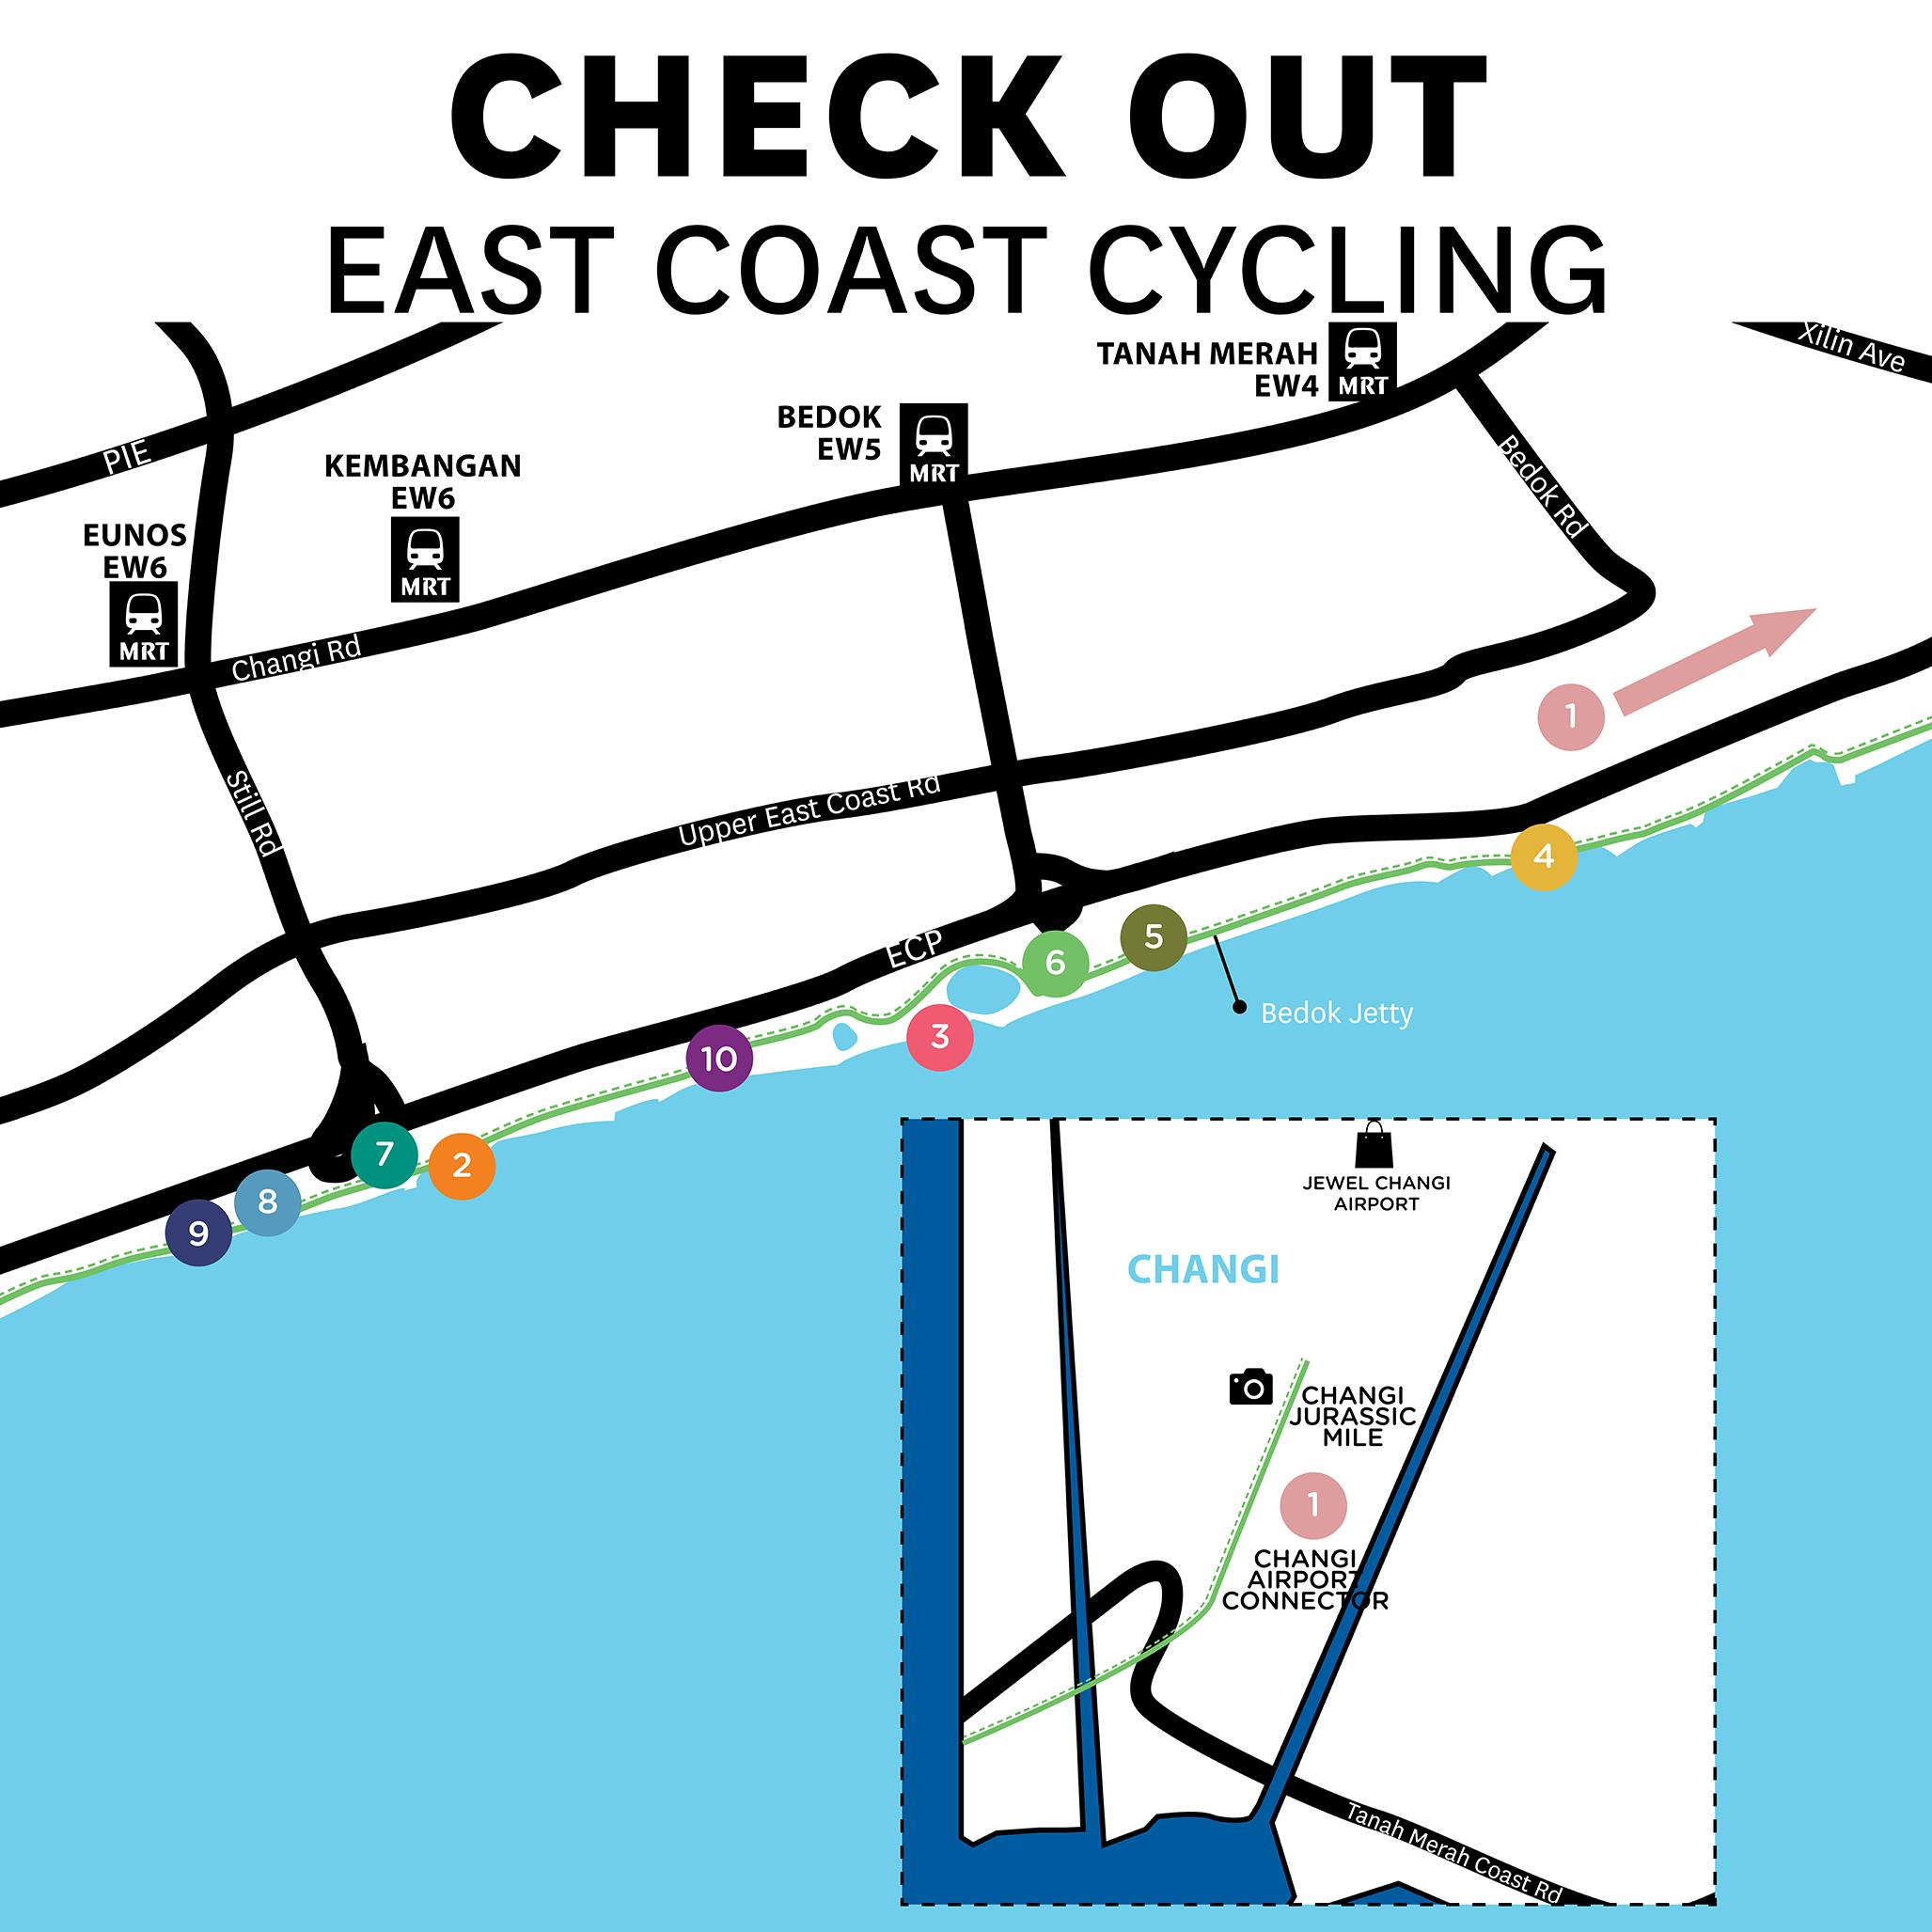 East Coast Cycling Map